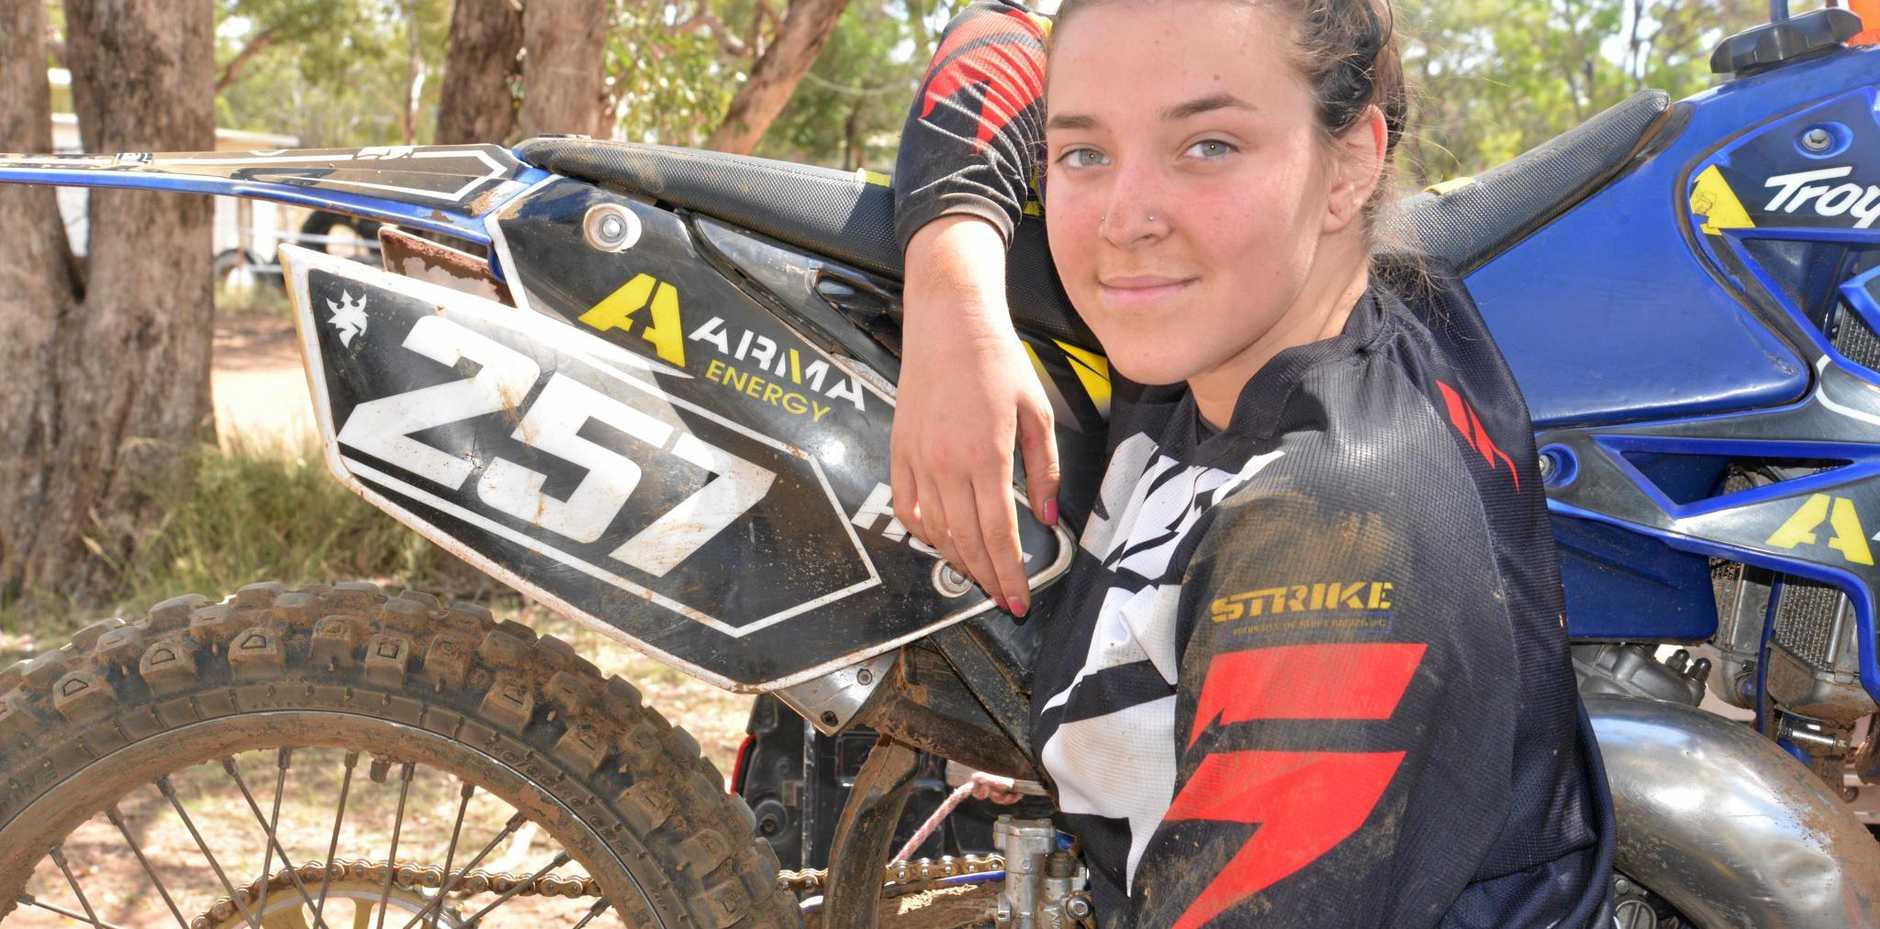 Gold Coast rider Jade Holz during a day of motocross at Morgan Park in Warwick.